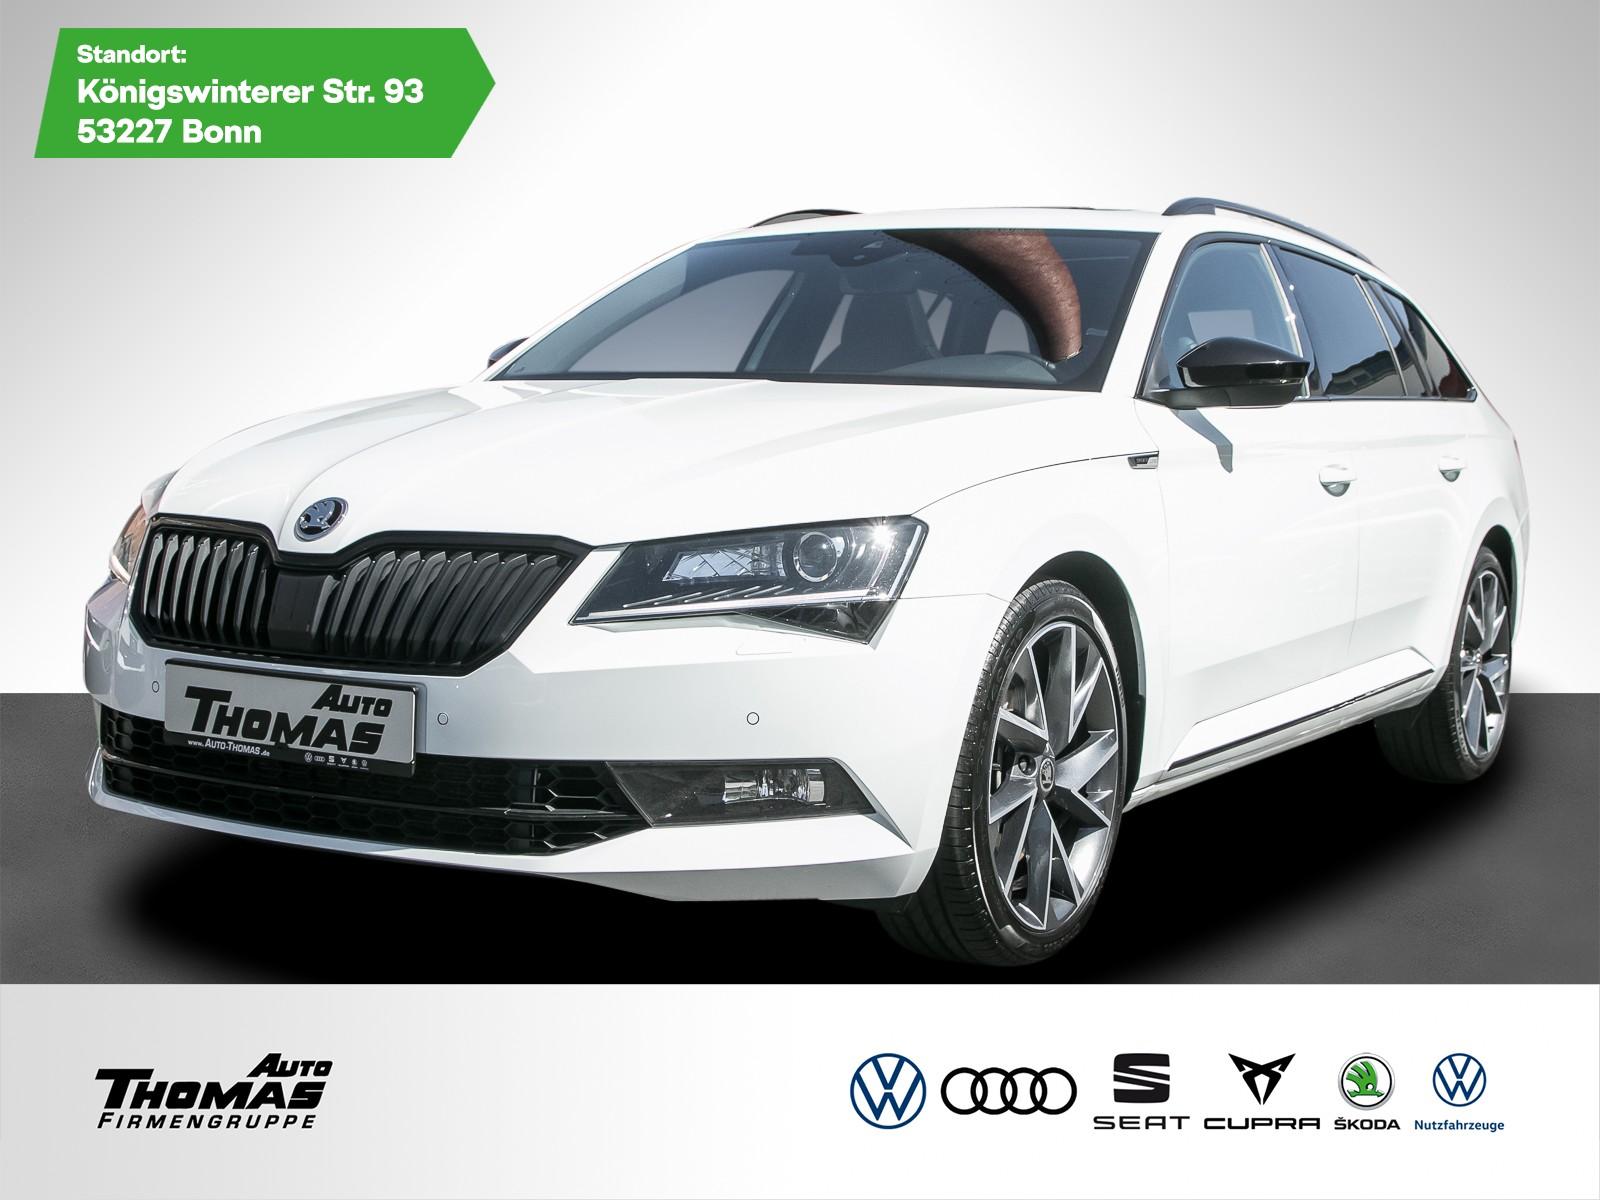 Skoda Superb III Combi Sportline 2.0 TSI DSG 4x4 *XEN*, Jahr 2017, Benzin